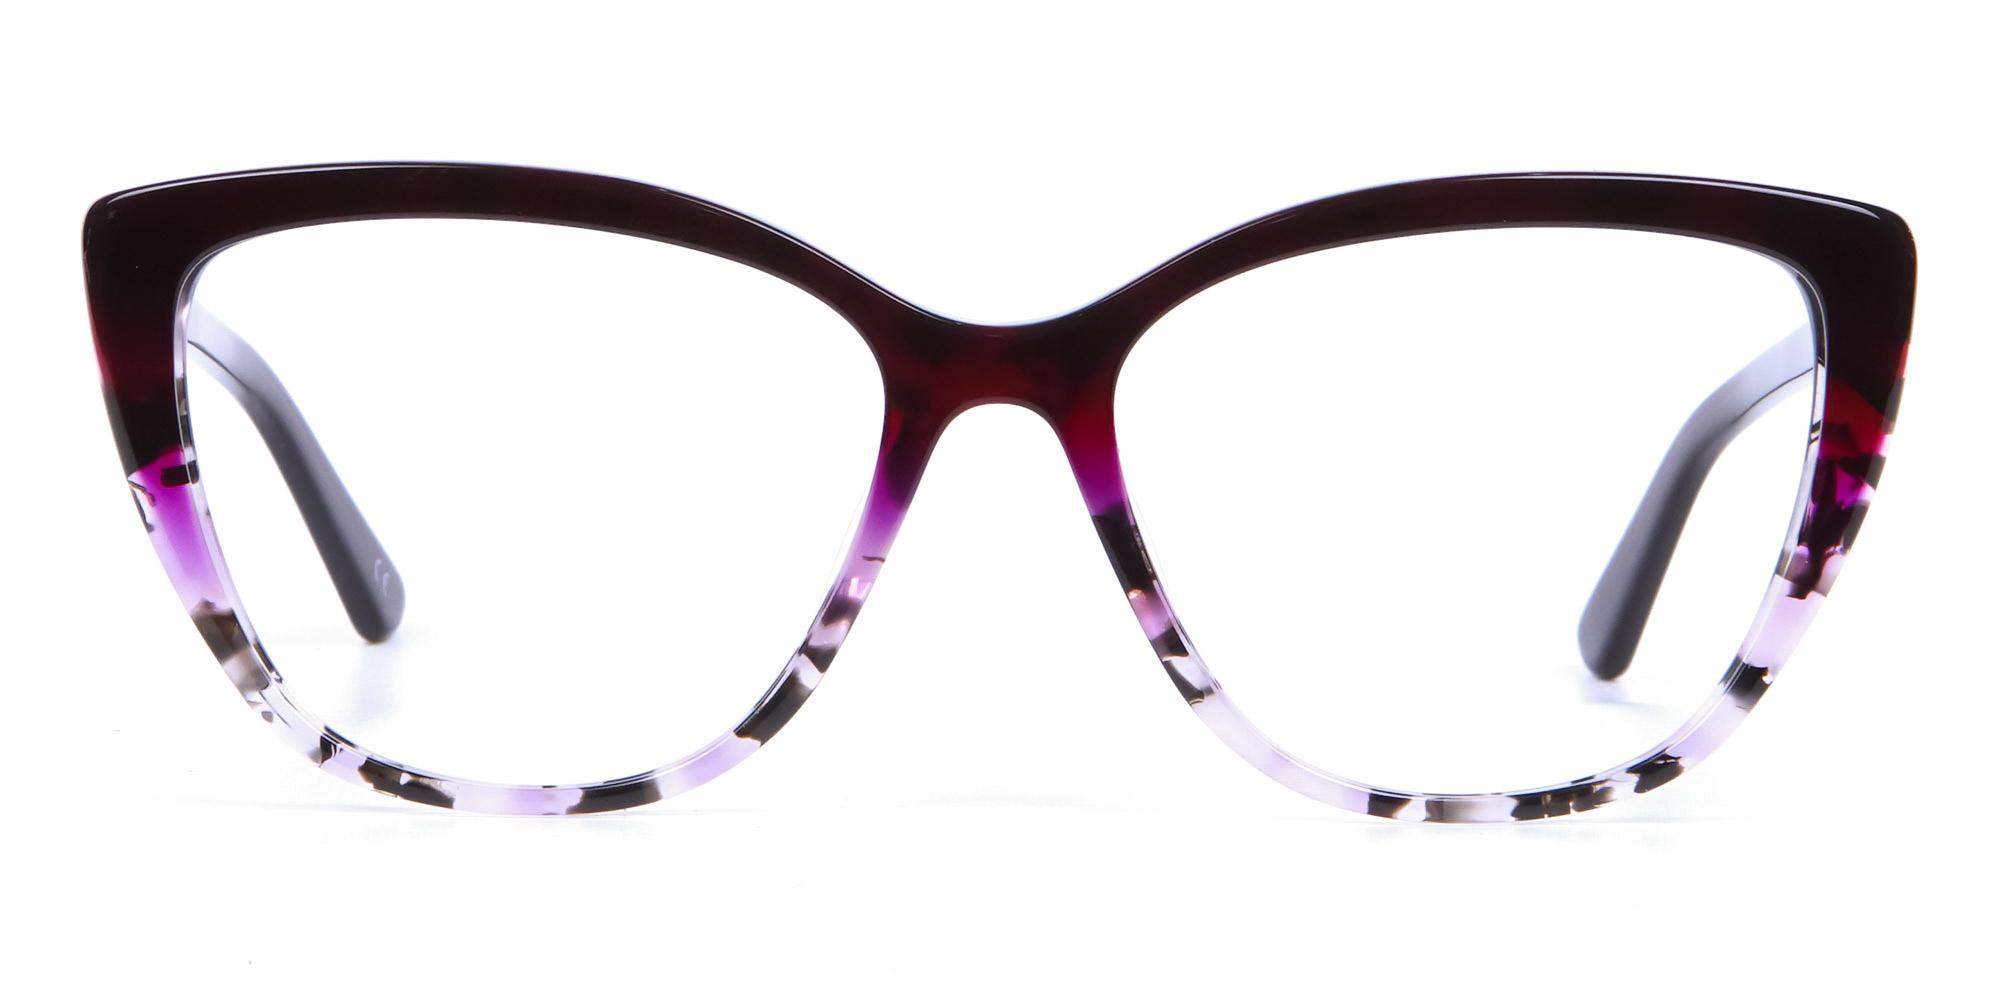 Oversized glasses eyewear trends 2020